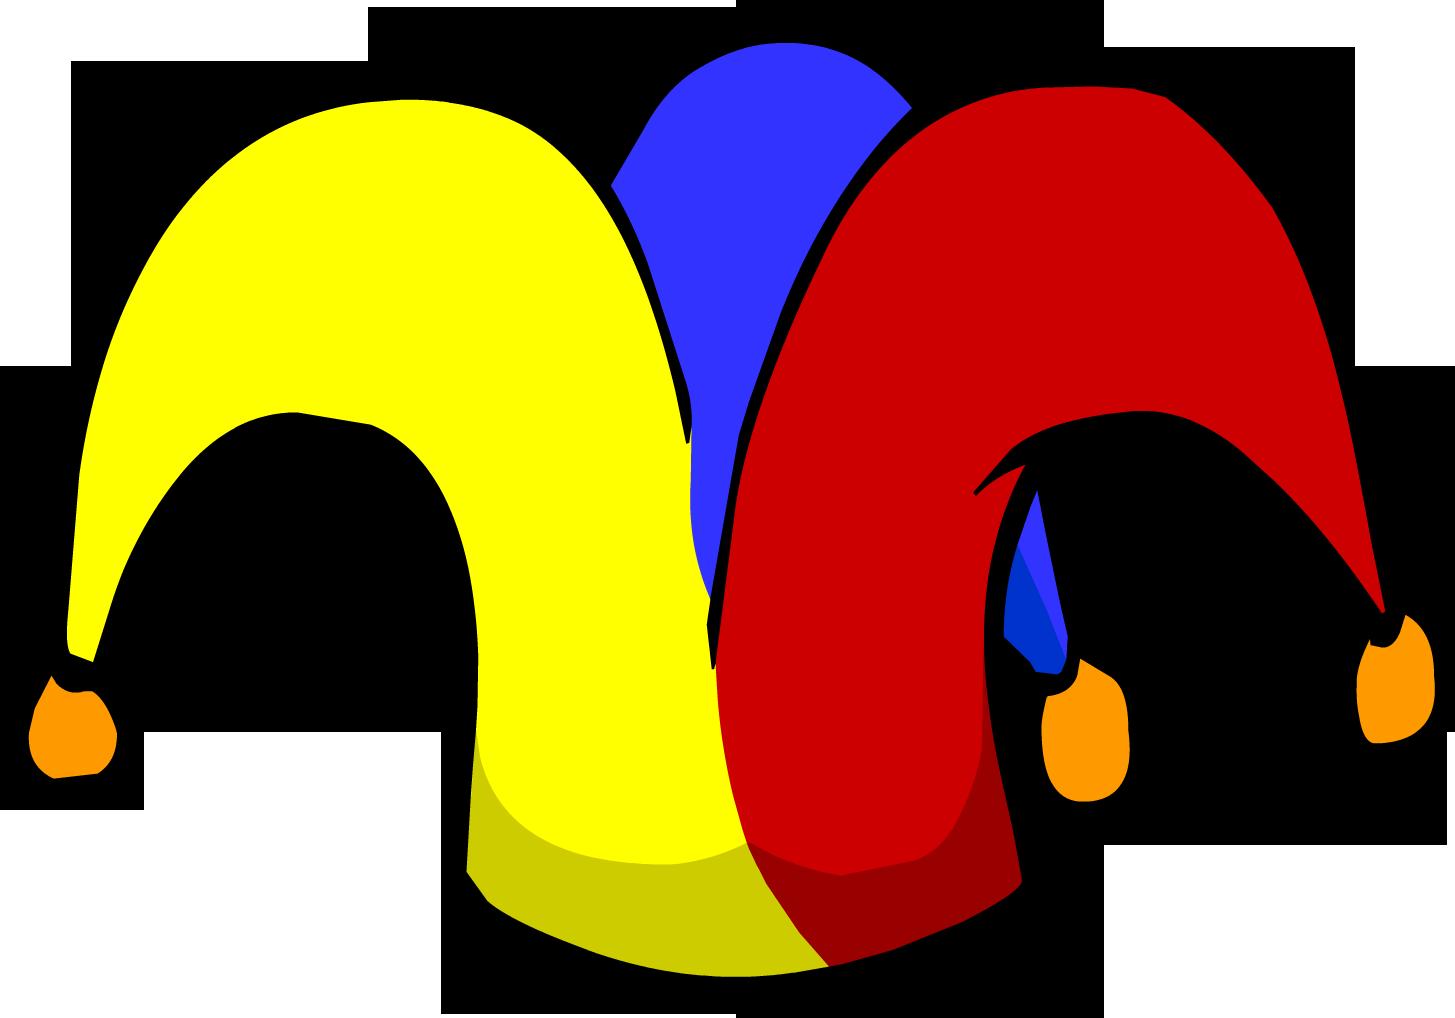 Joker cap clipart png Jester Hat | Club Penguin Wiki | Fandom powered by Wikia png